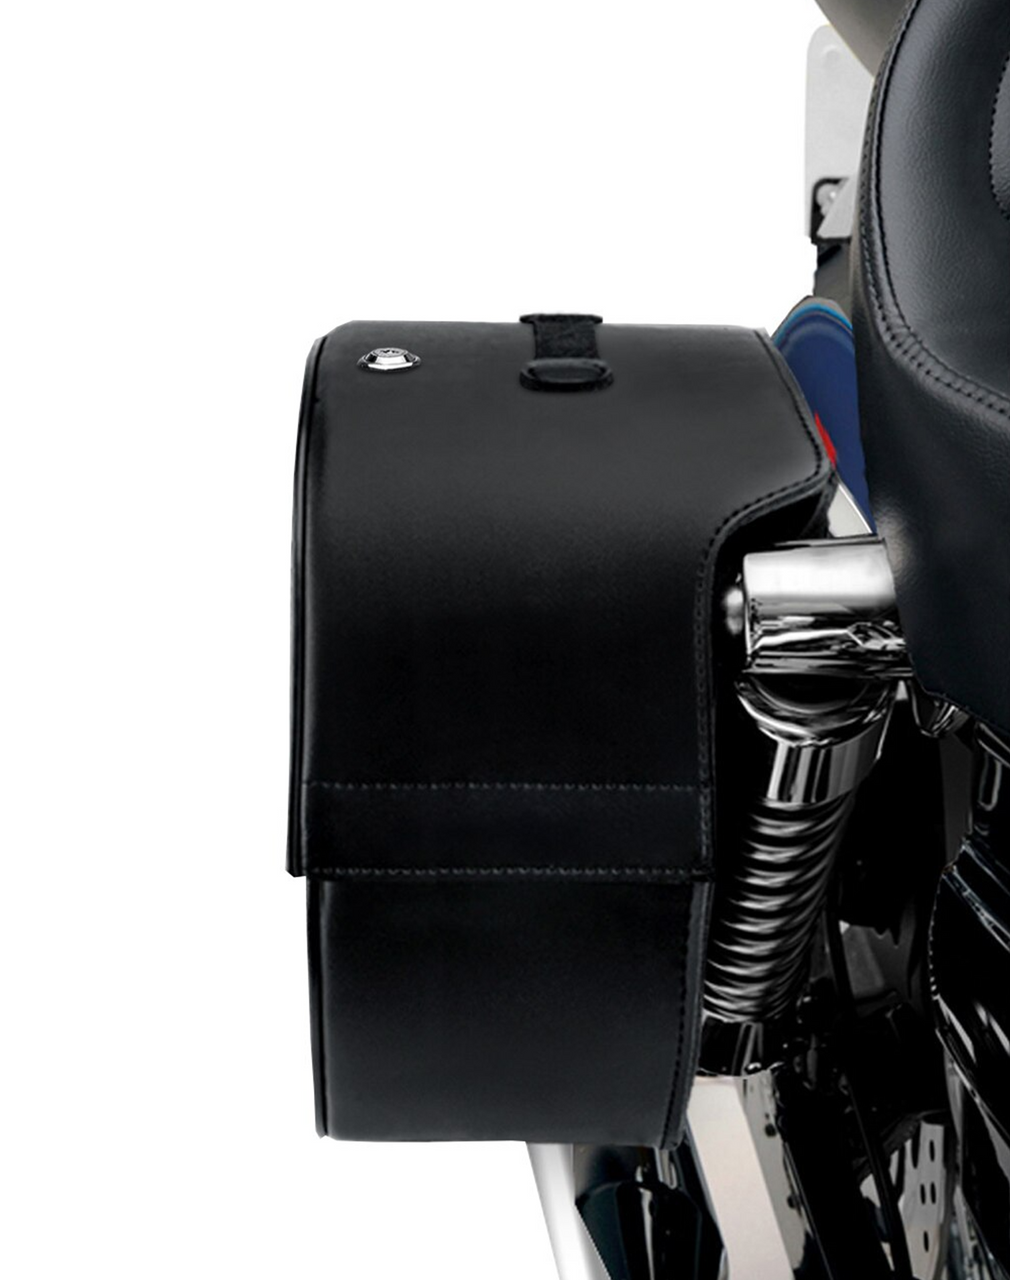 Kawasaki Vulcan 750 Armor Shock Cutout Large Motorcycle Saddlebags shock cutout view